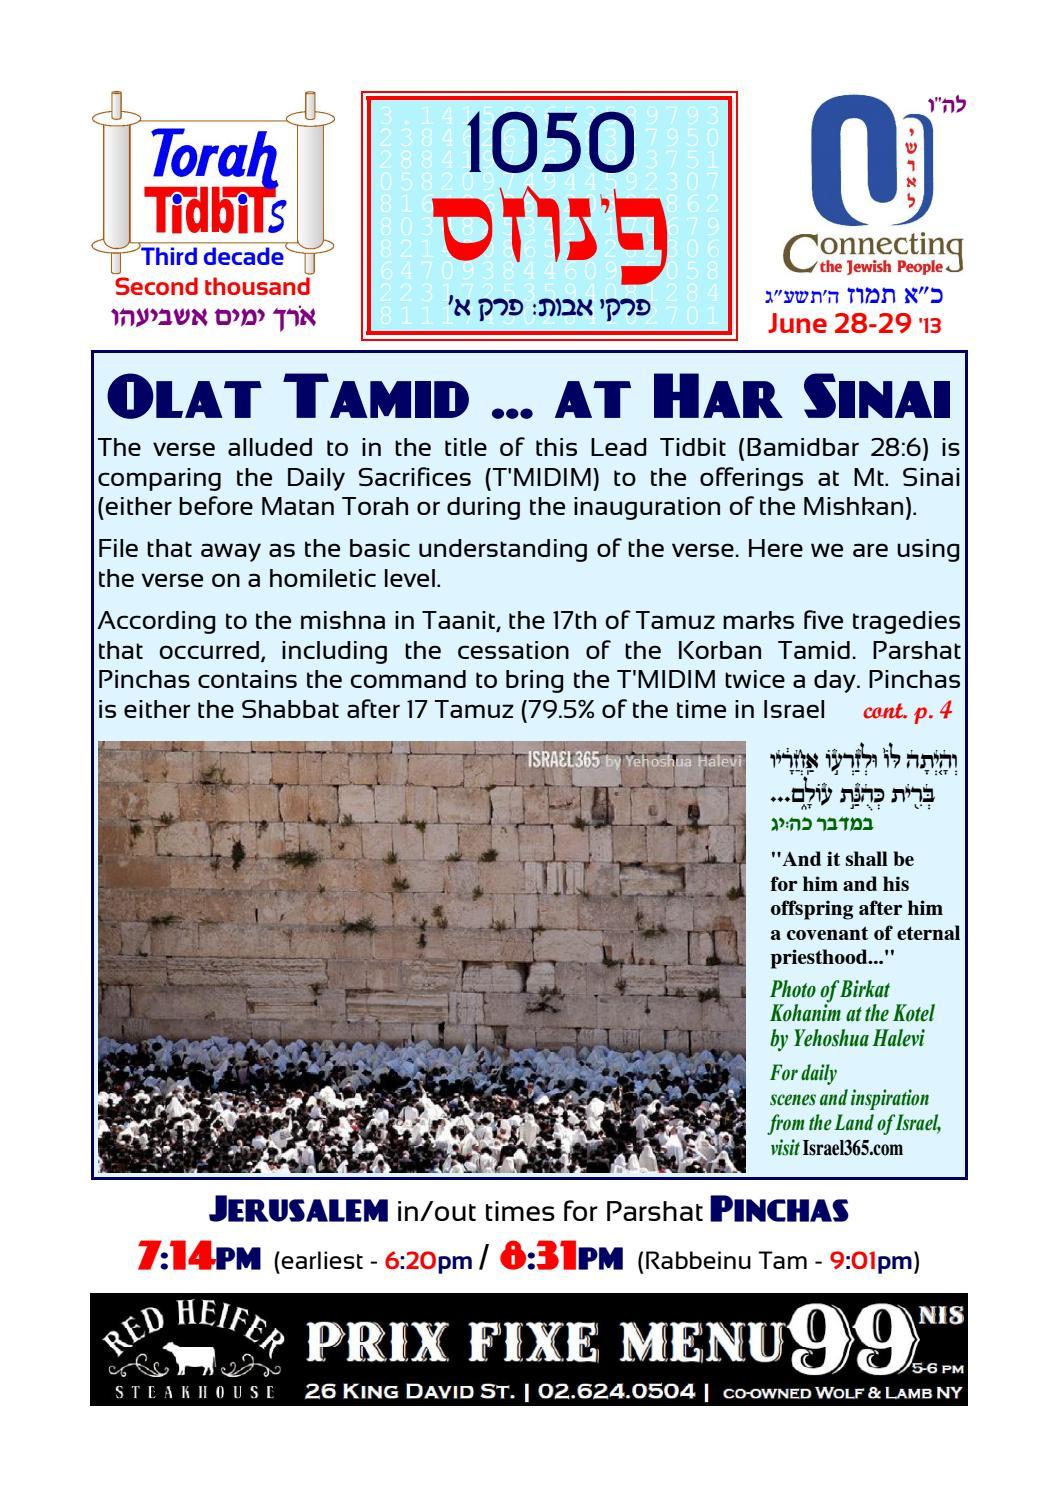 Torah Tidbits Sample Issue by Bizness Magazine - issuu